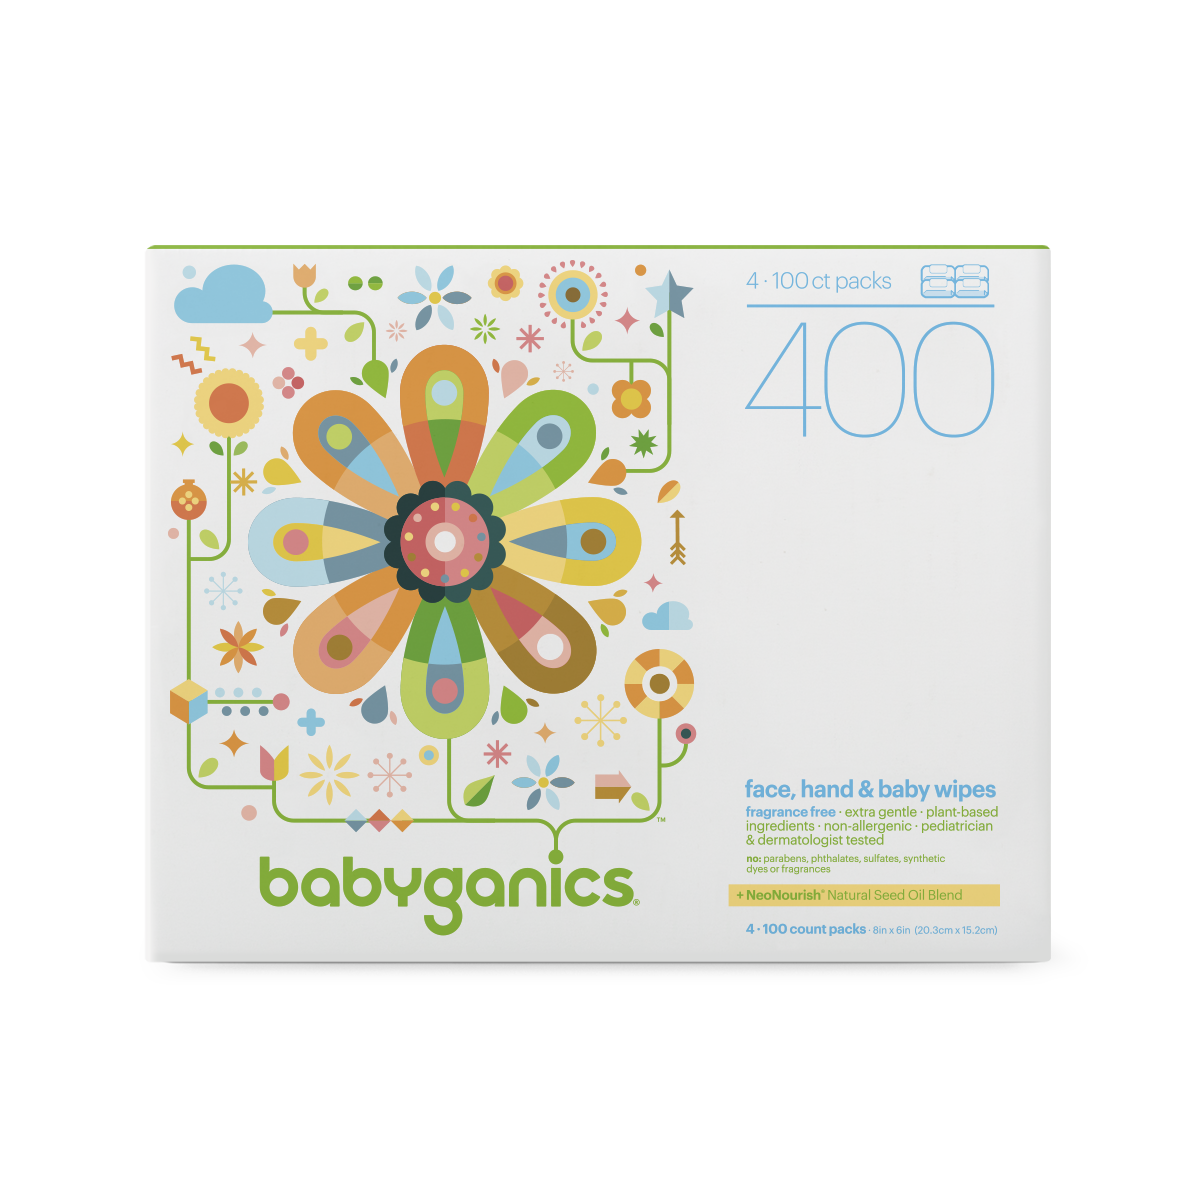 BabyGanics Face, Hand & Baby Wipes Fragrance Free 400 Wipe(s) by BabyGanics